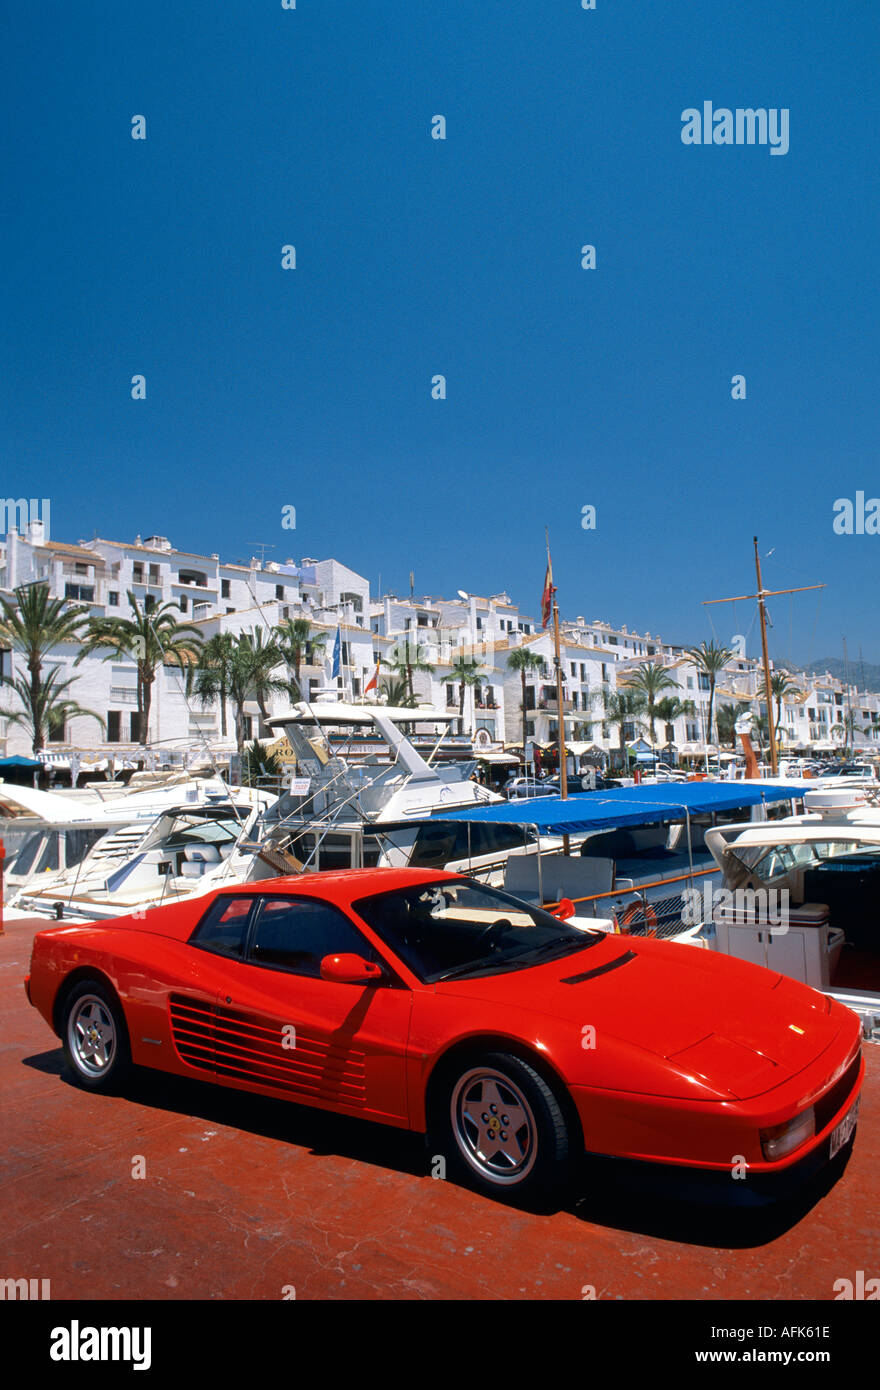 spain andalucia marbella puerto banus